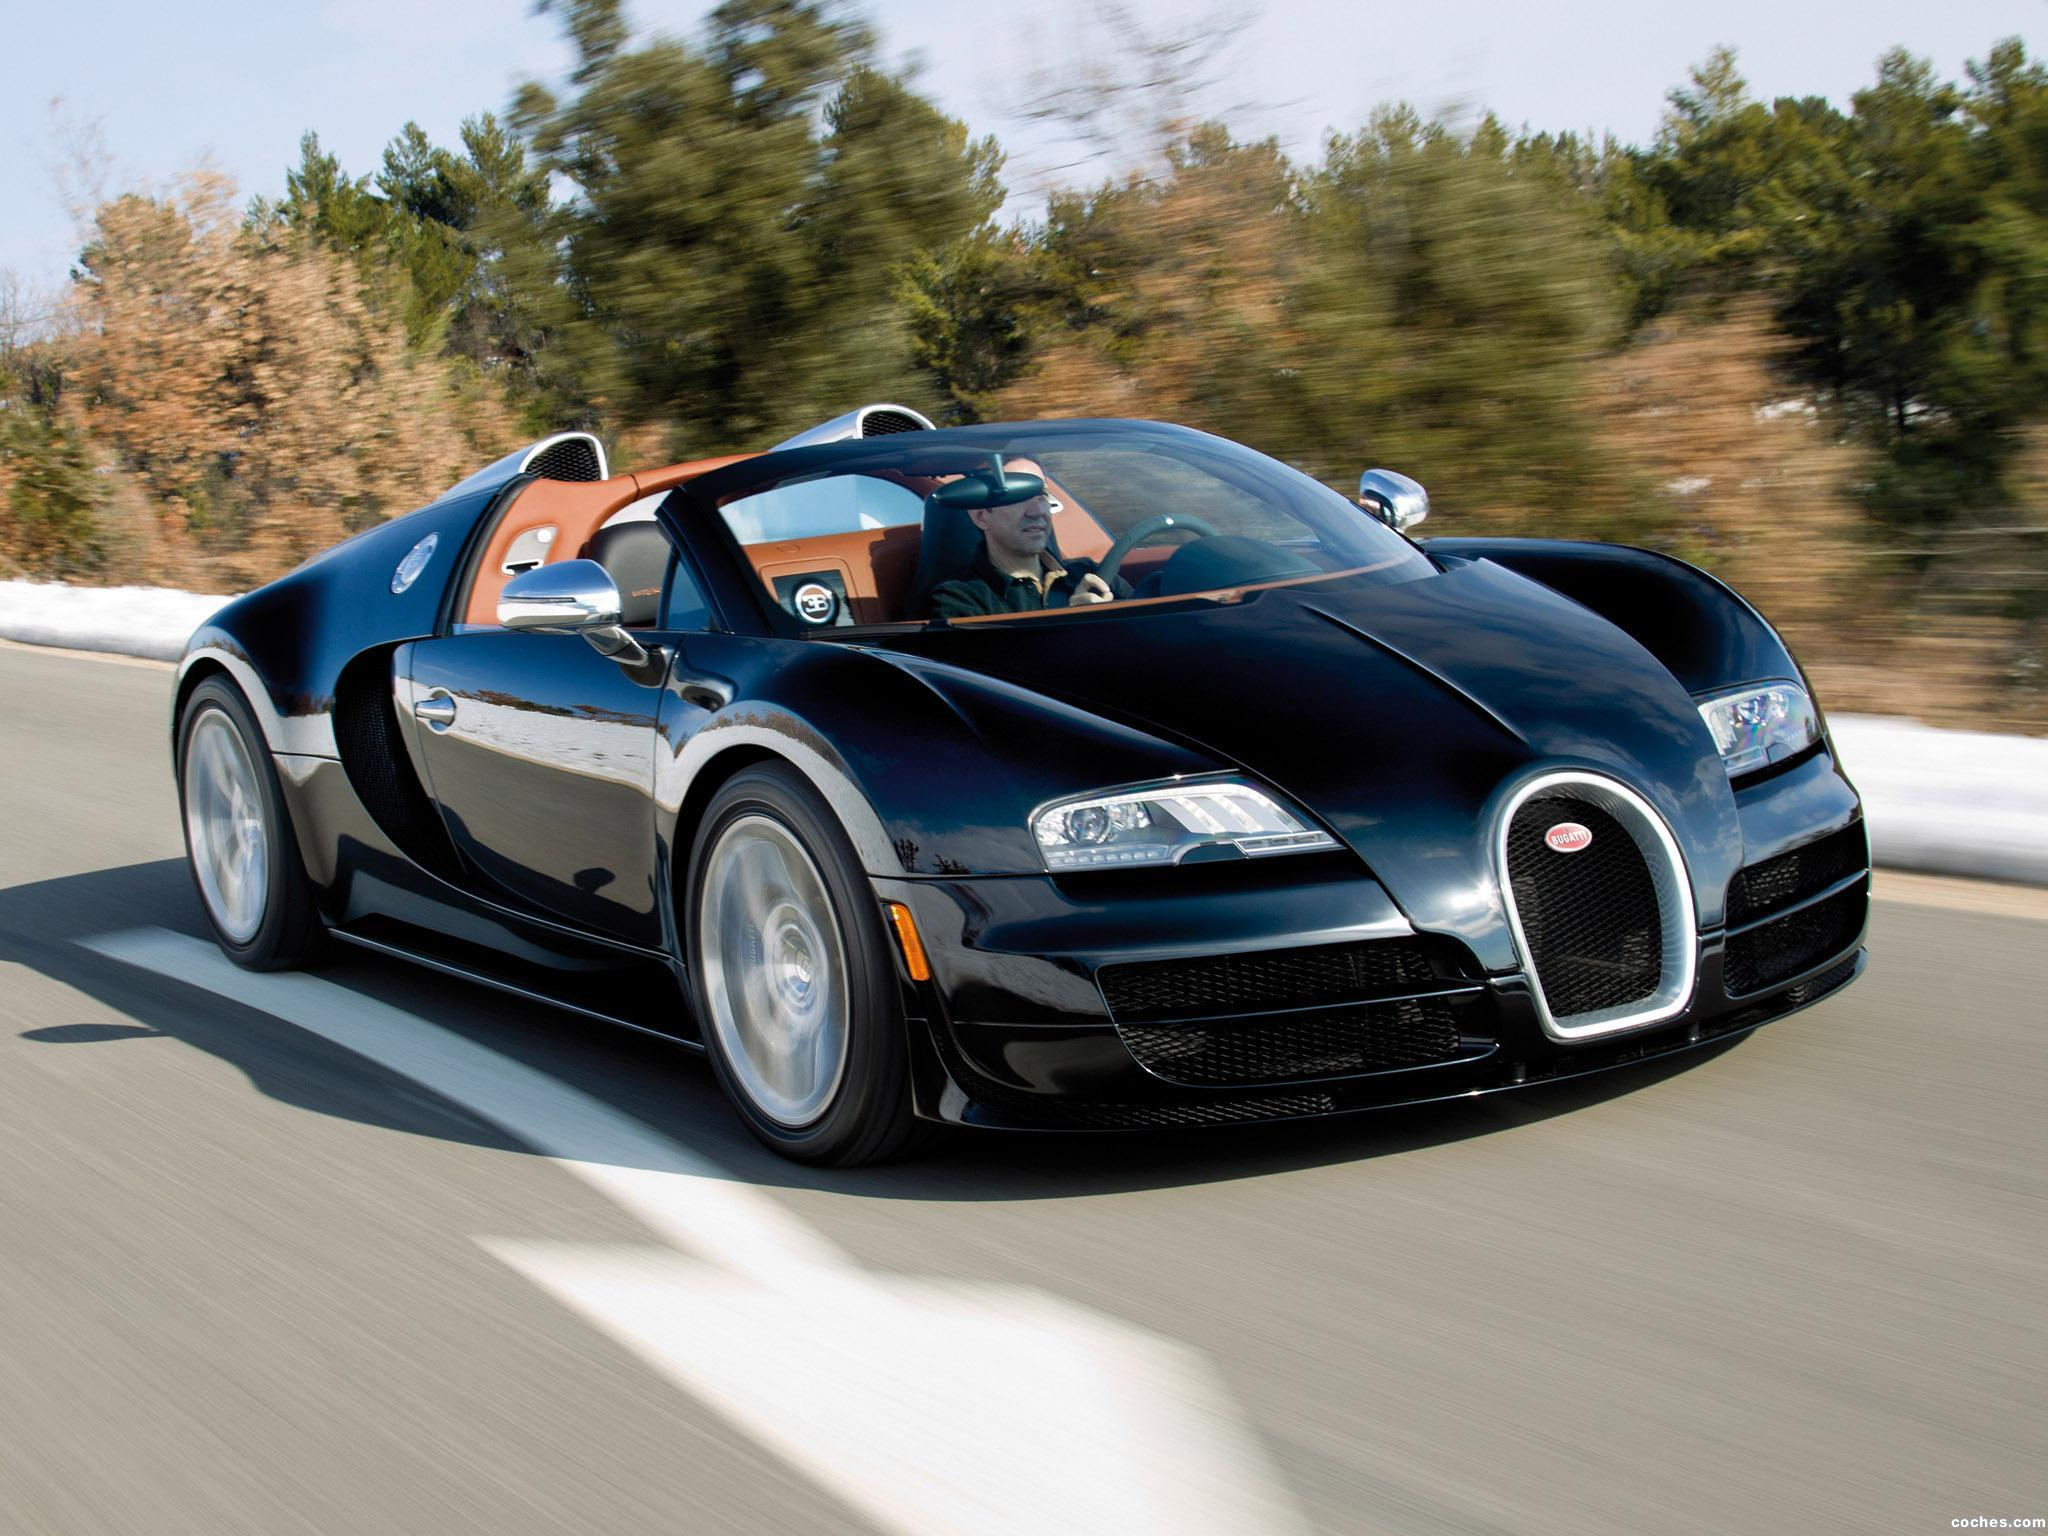 bugatti_veyron-grand-sport-roadster-vitesse-2012_r2 Remarkable Bugatti Veyron Grand Sport Vitesse Informacion Cars Trend